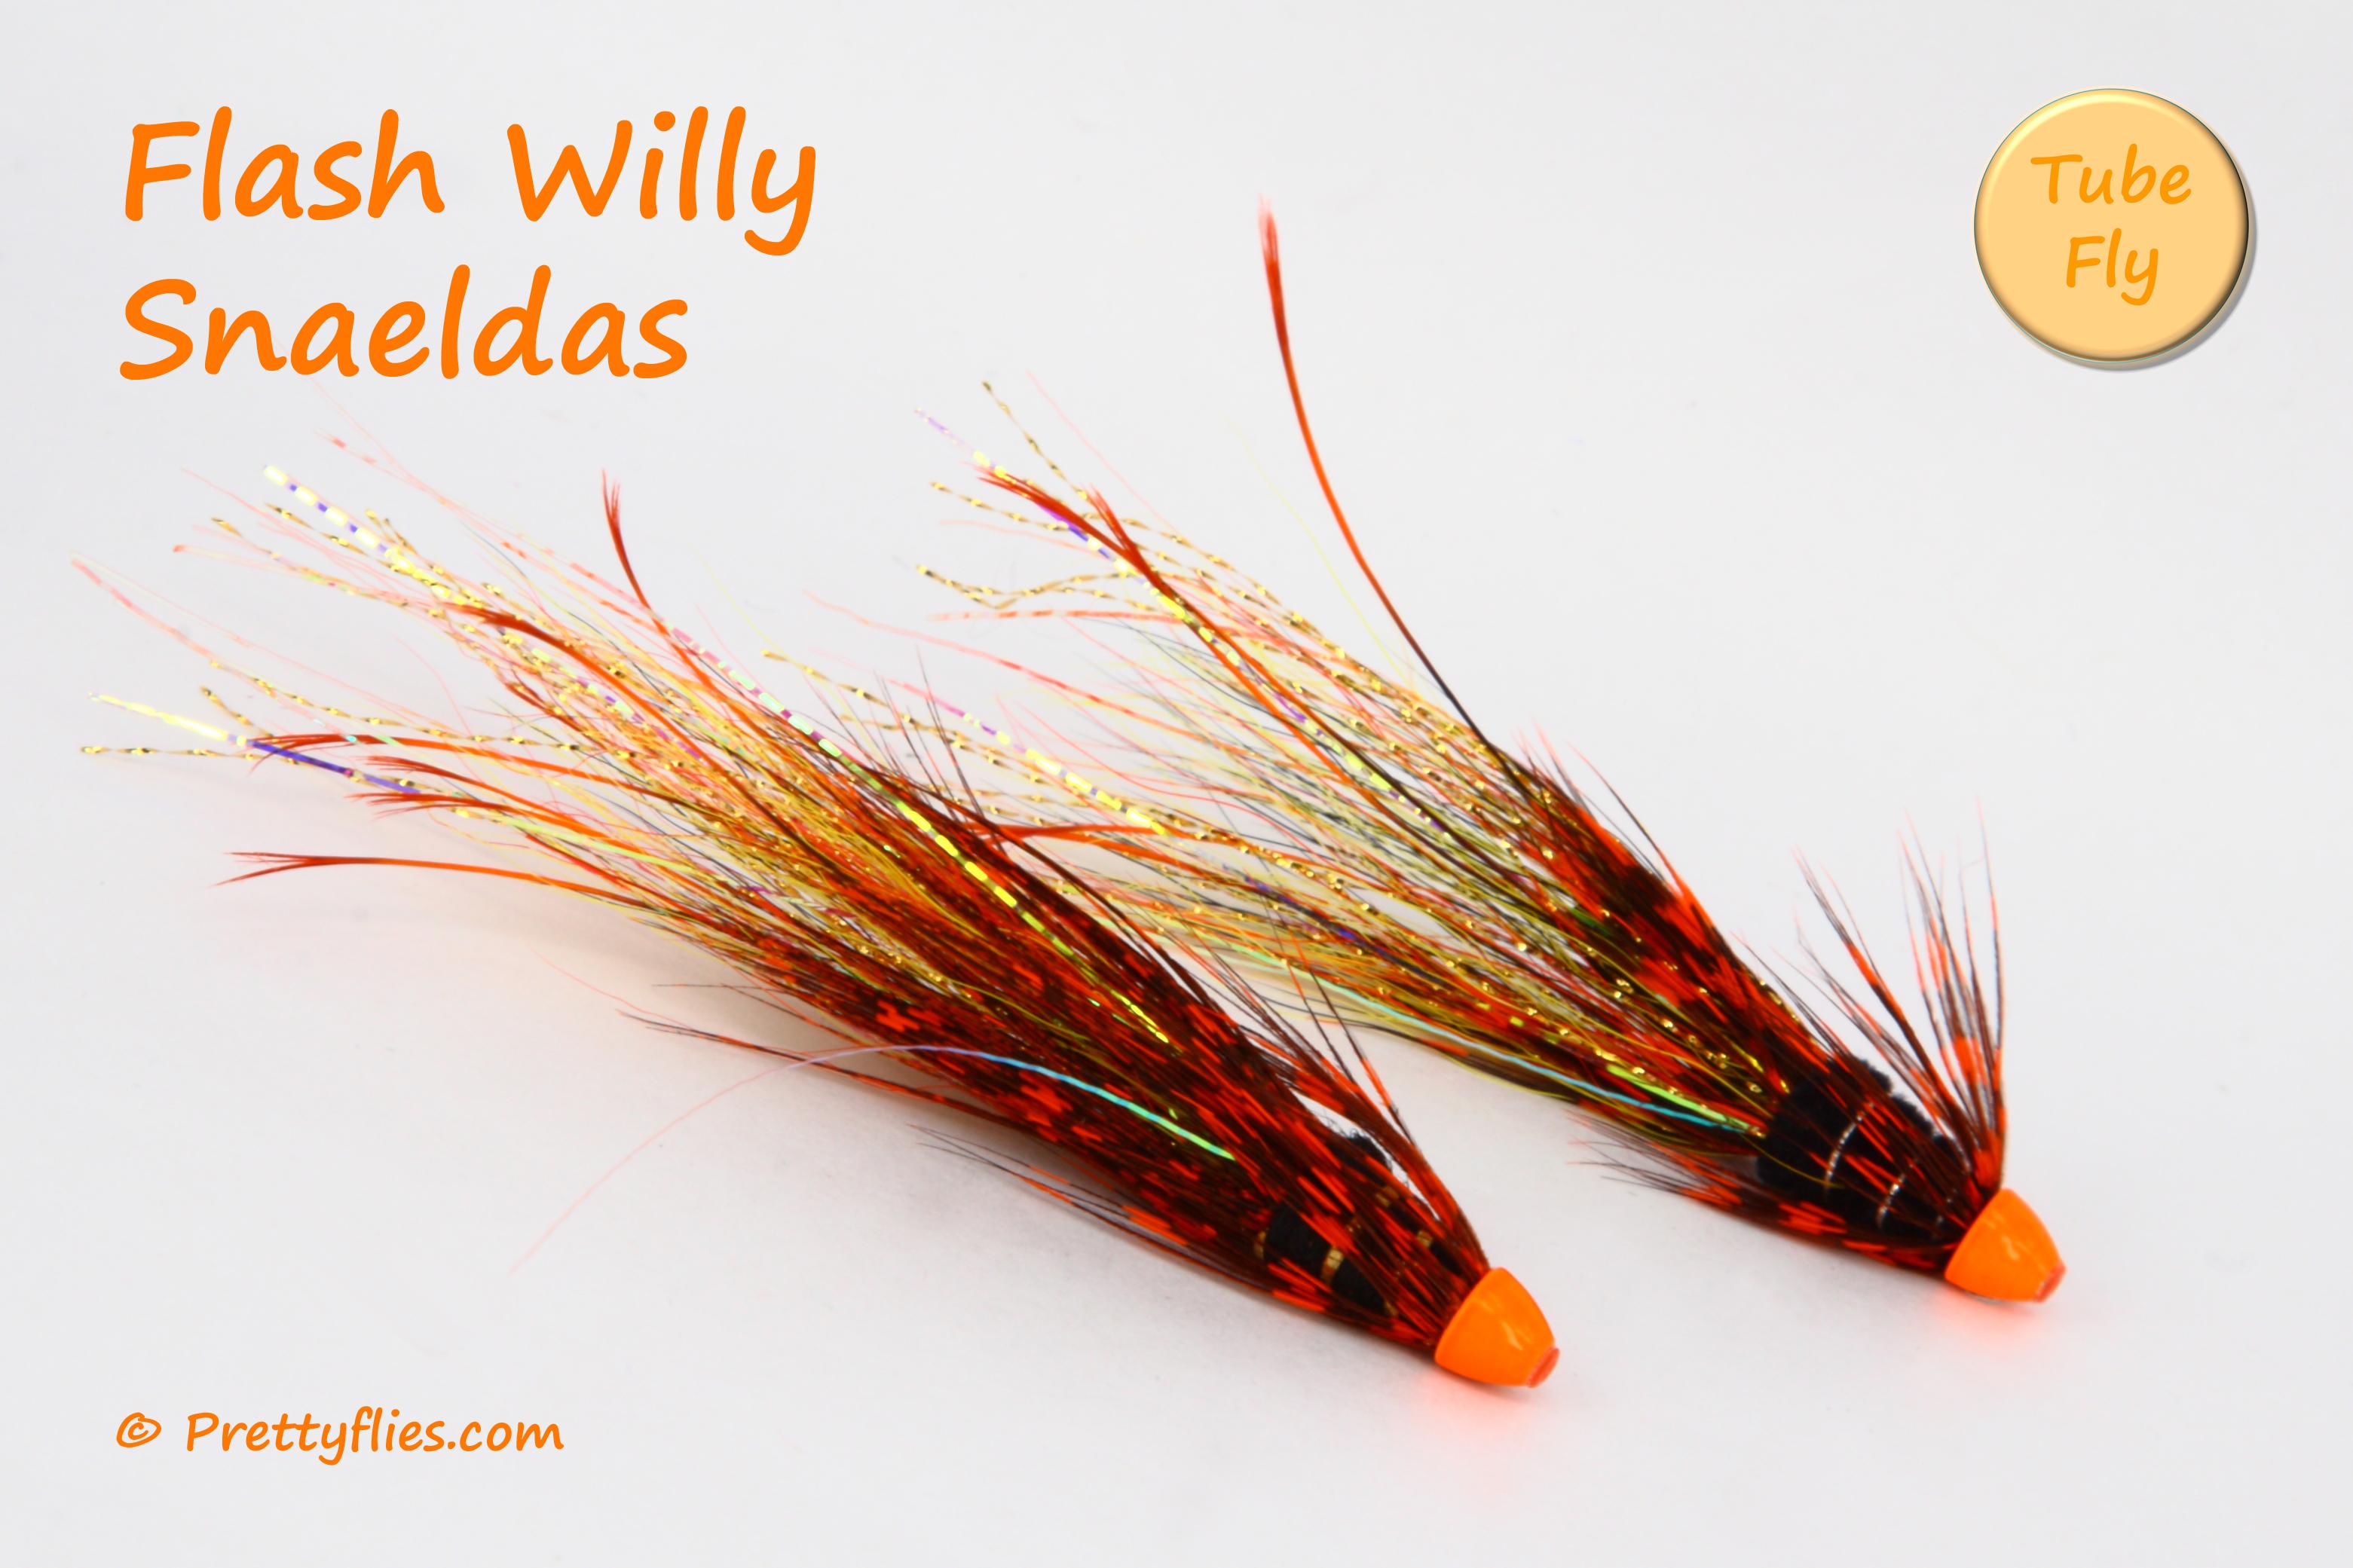 Flash Willy Snaeldas2 copy.jpg